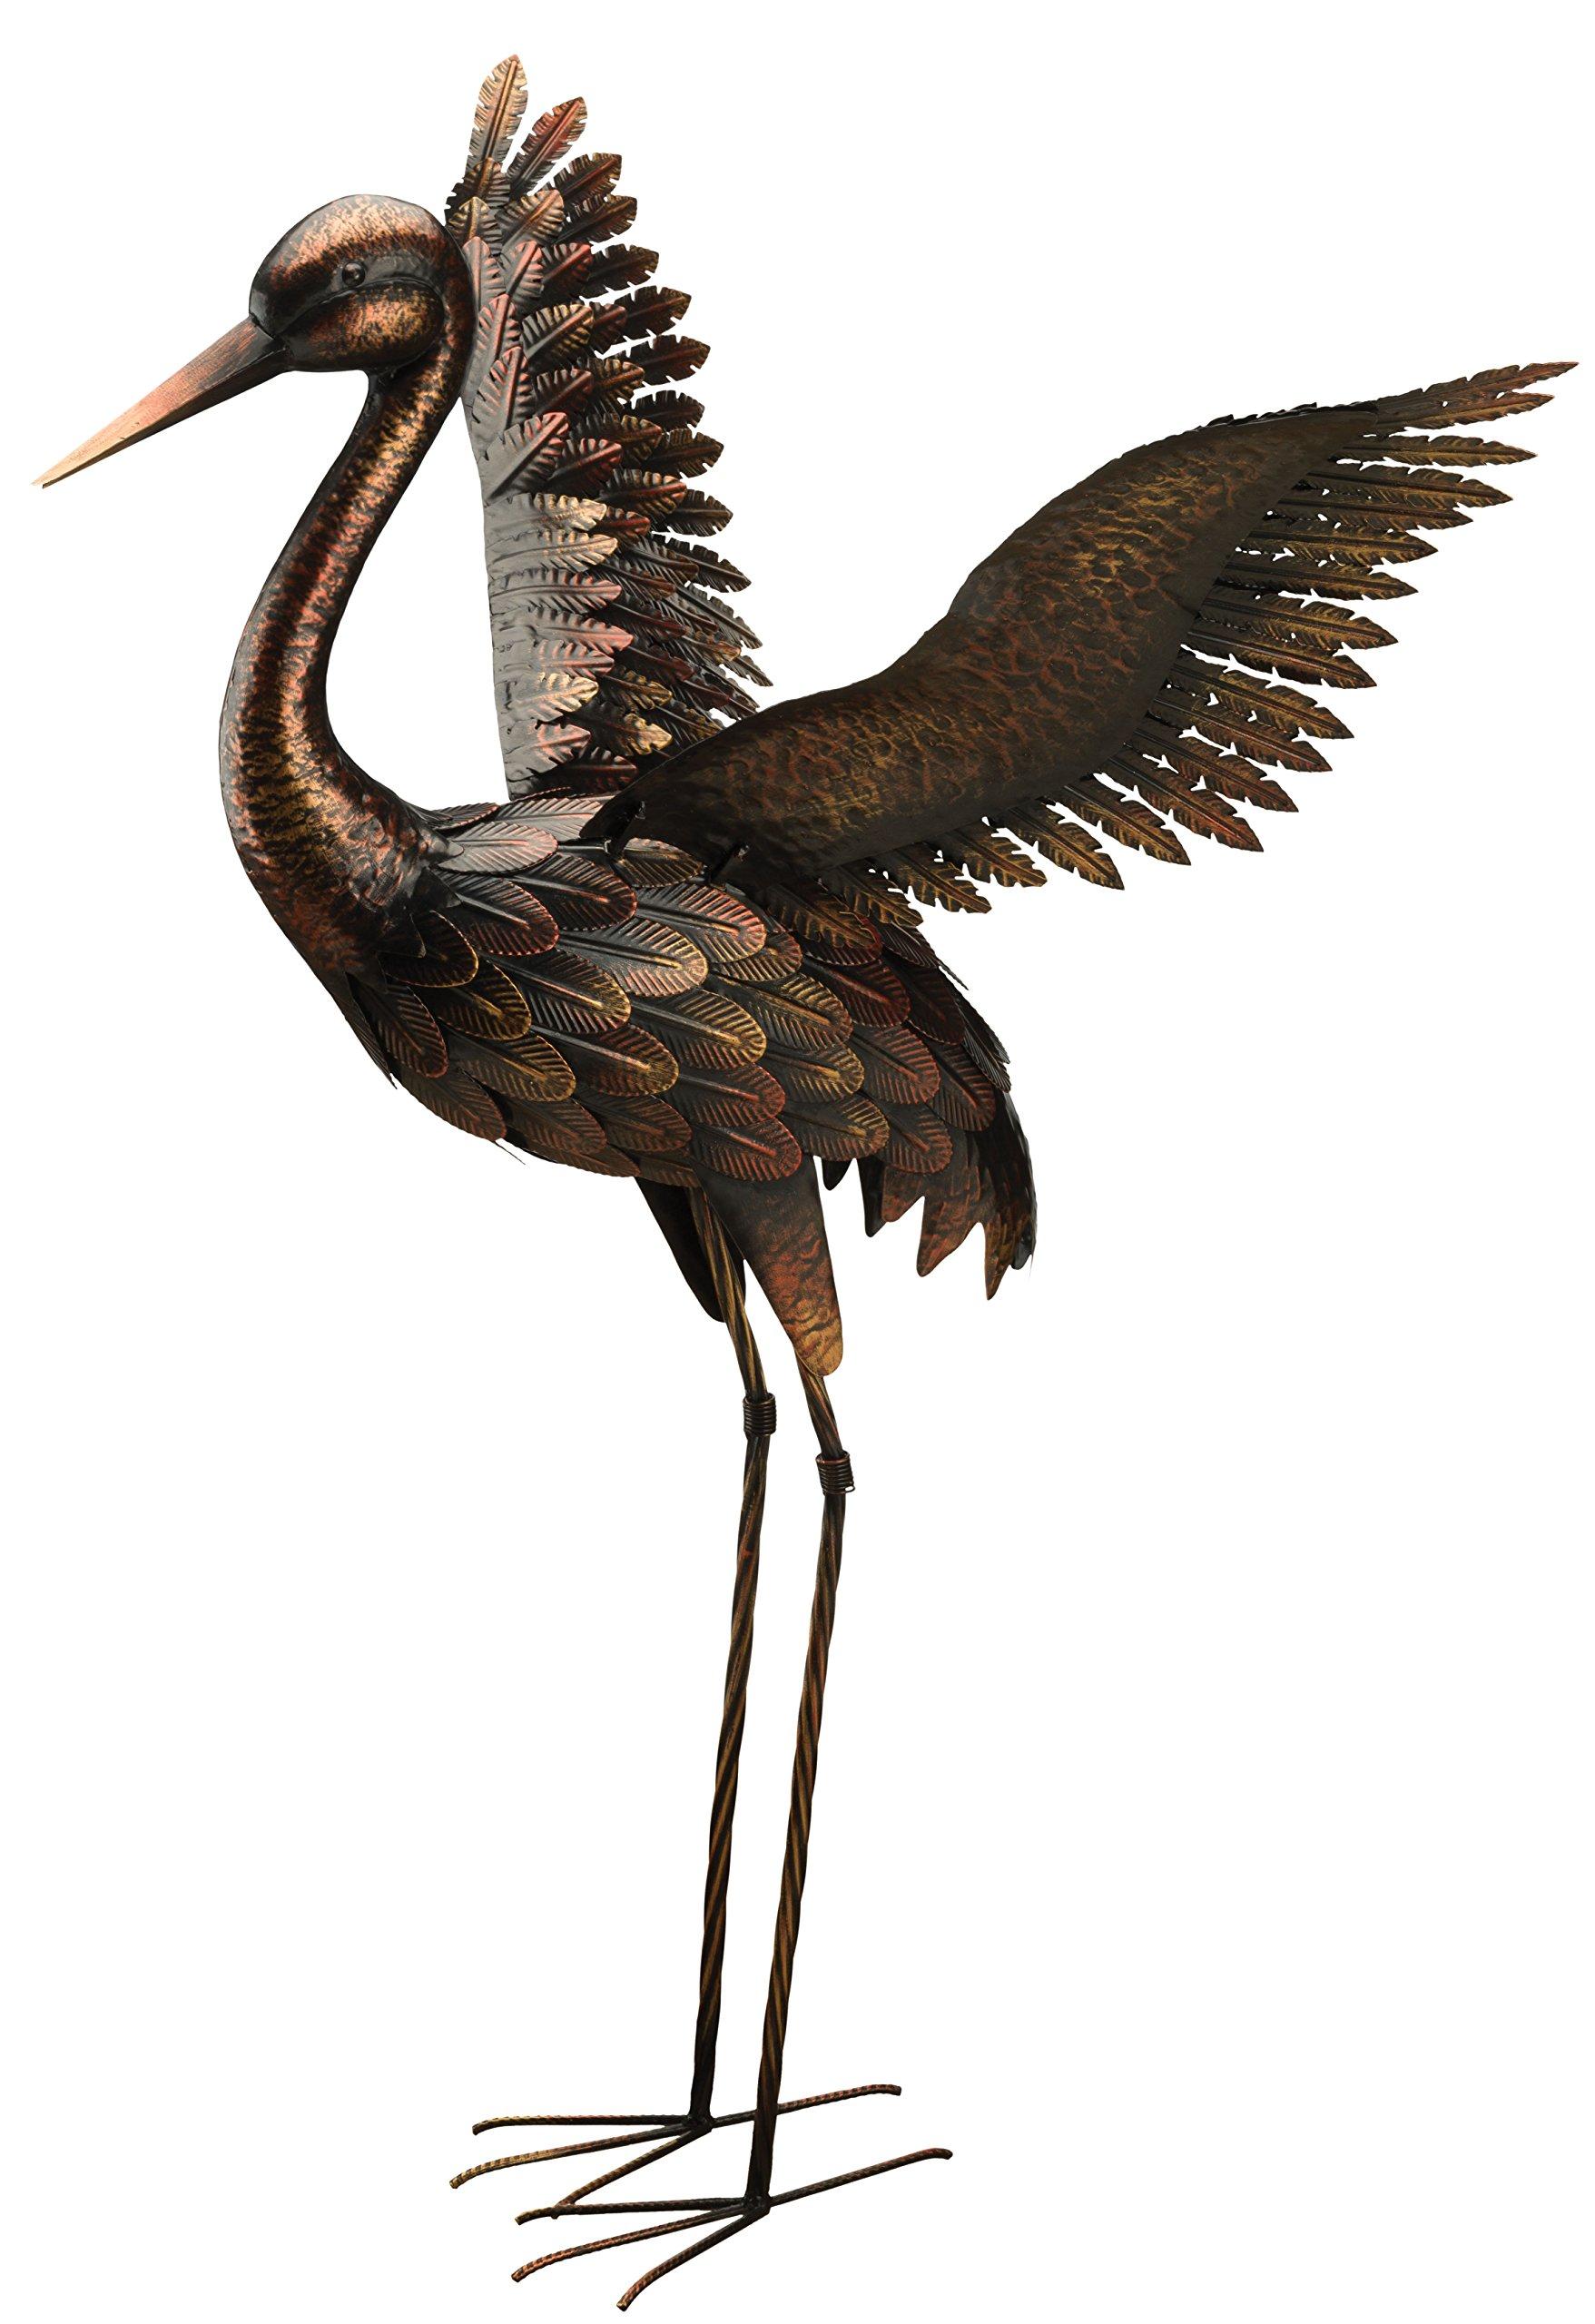 Regal Art & Gift Wings Up Crane, 44'', Bronze